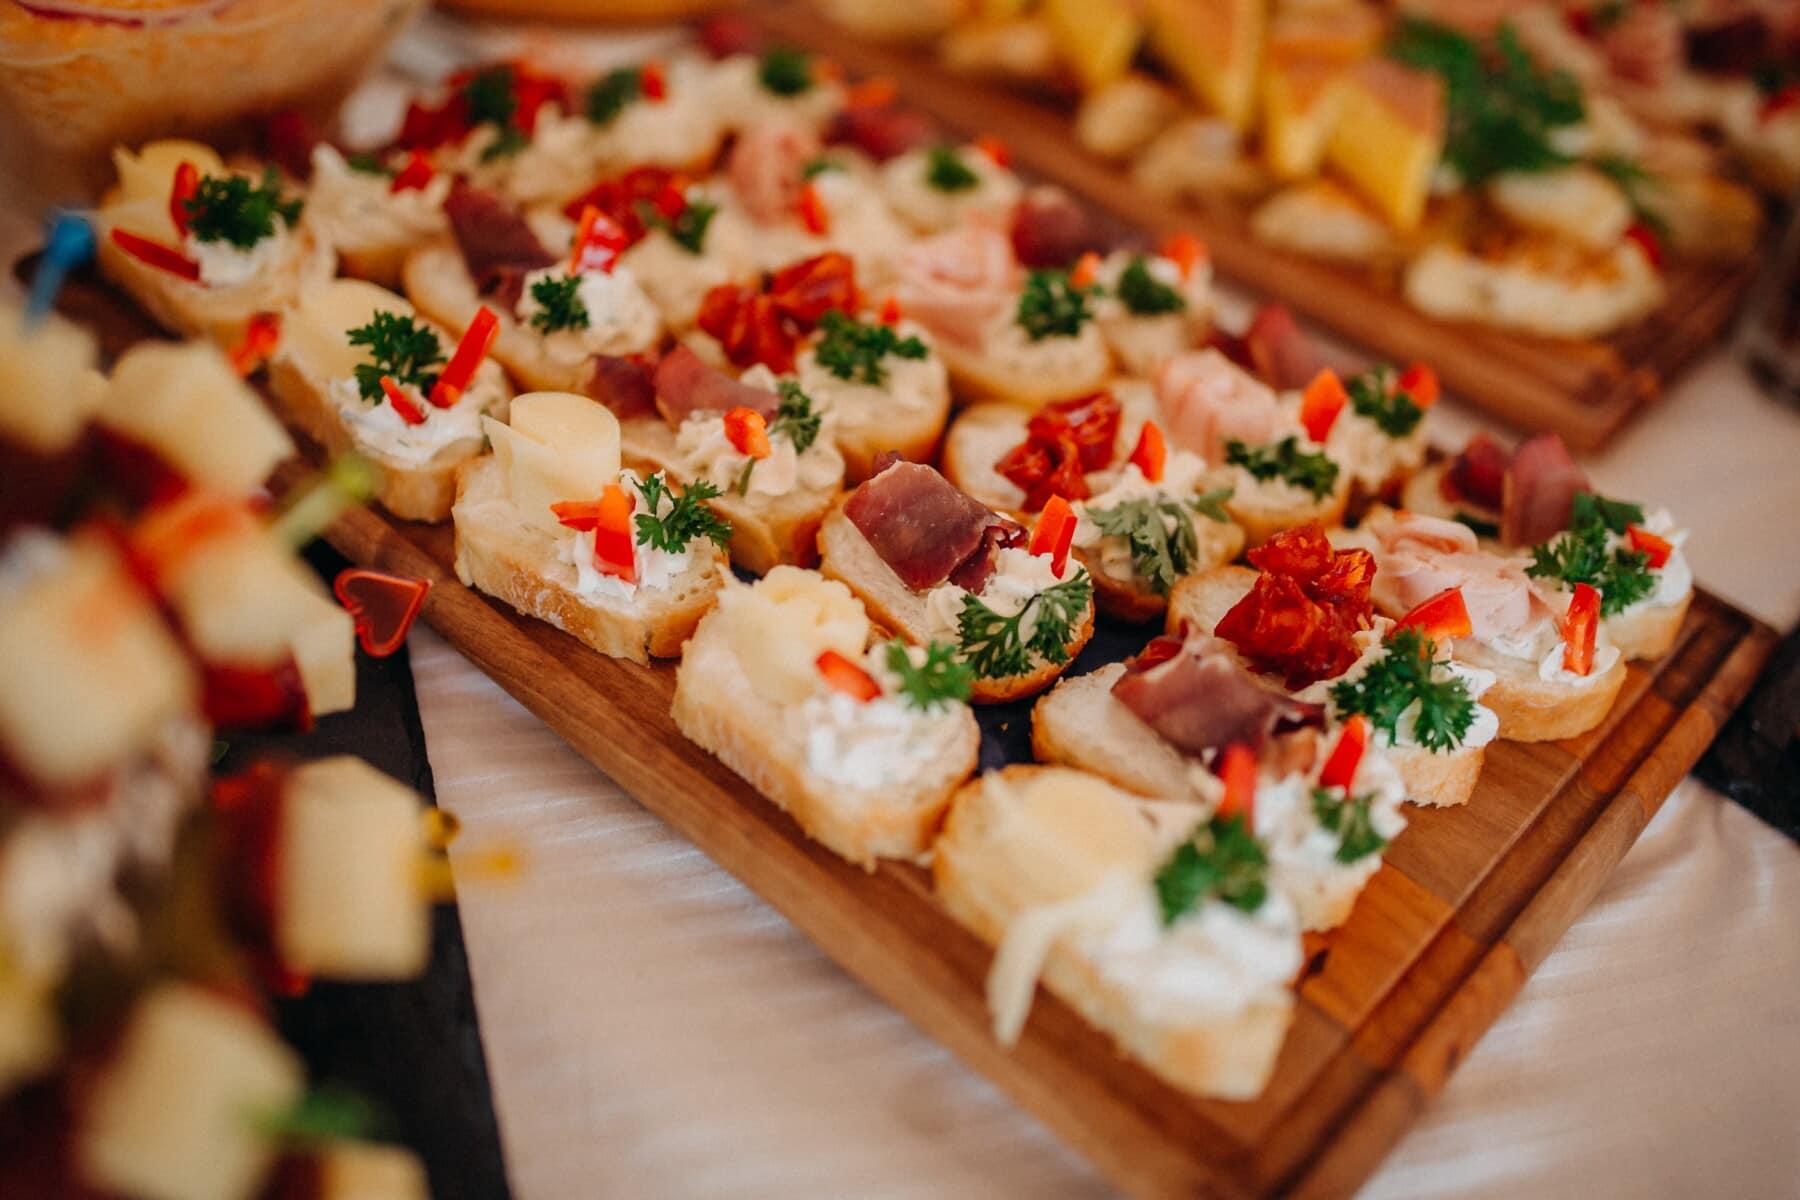 miniature, sandwich, jambon, fromage, snack, buffet, apéritif, déjeuner, délicieux, dîner